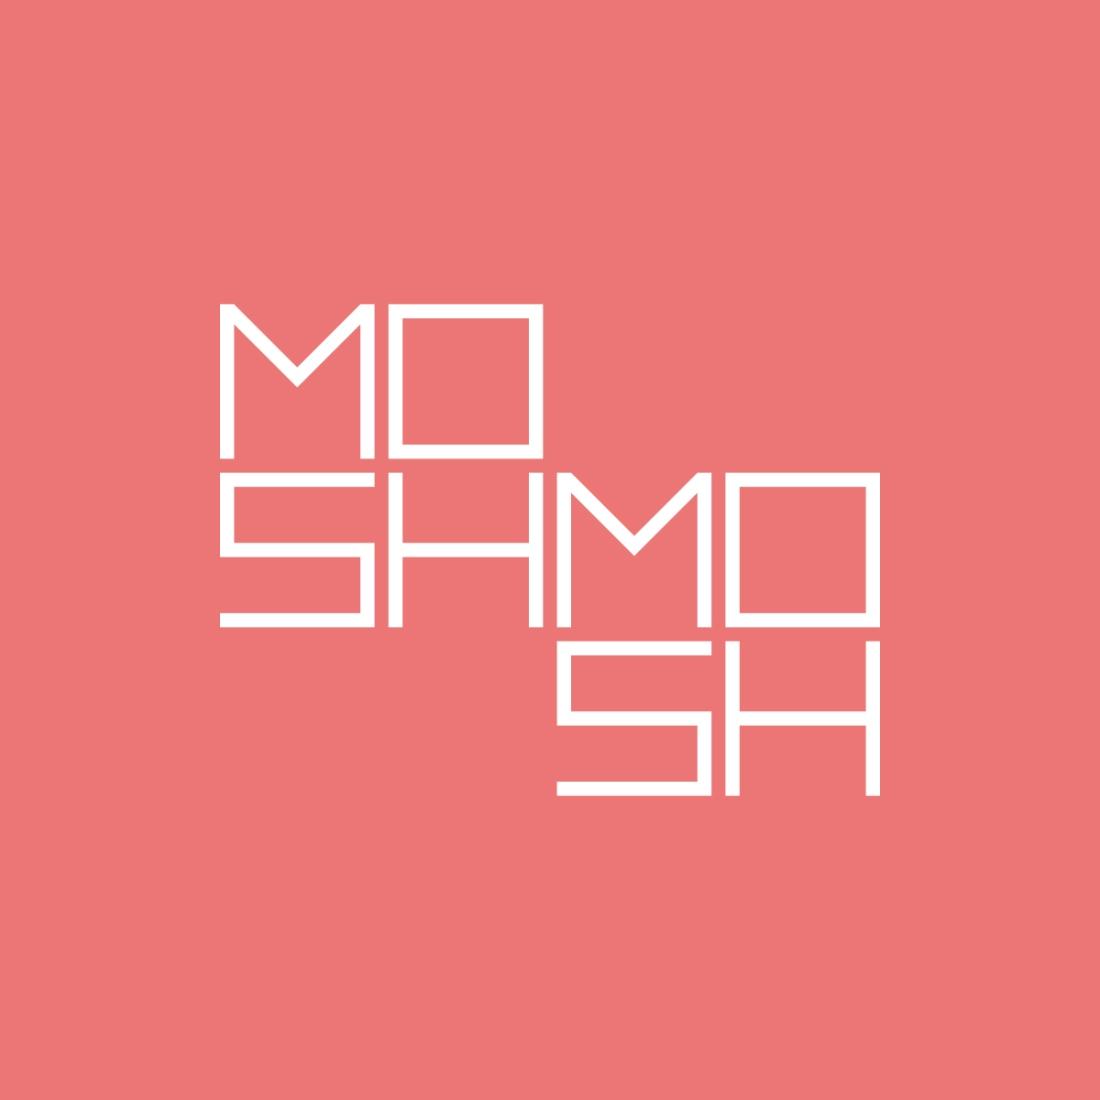 JekabsonsDotCom_logo_MOSHMOSH_01